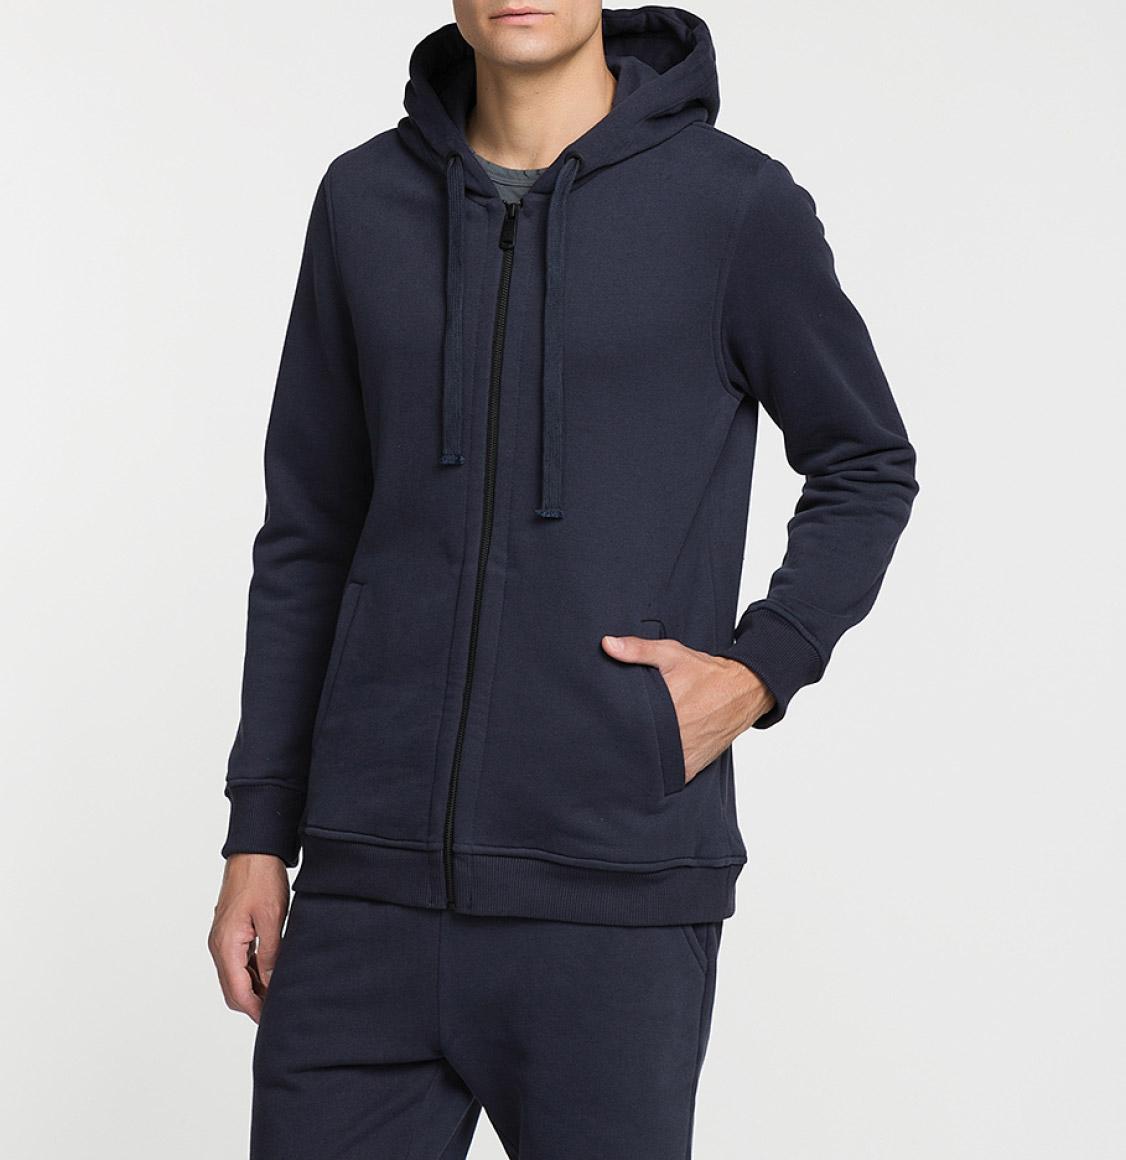 Organic Cotton Zip Up Hoodie Navy Blue